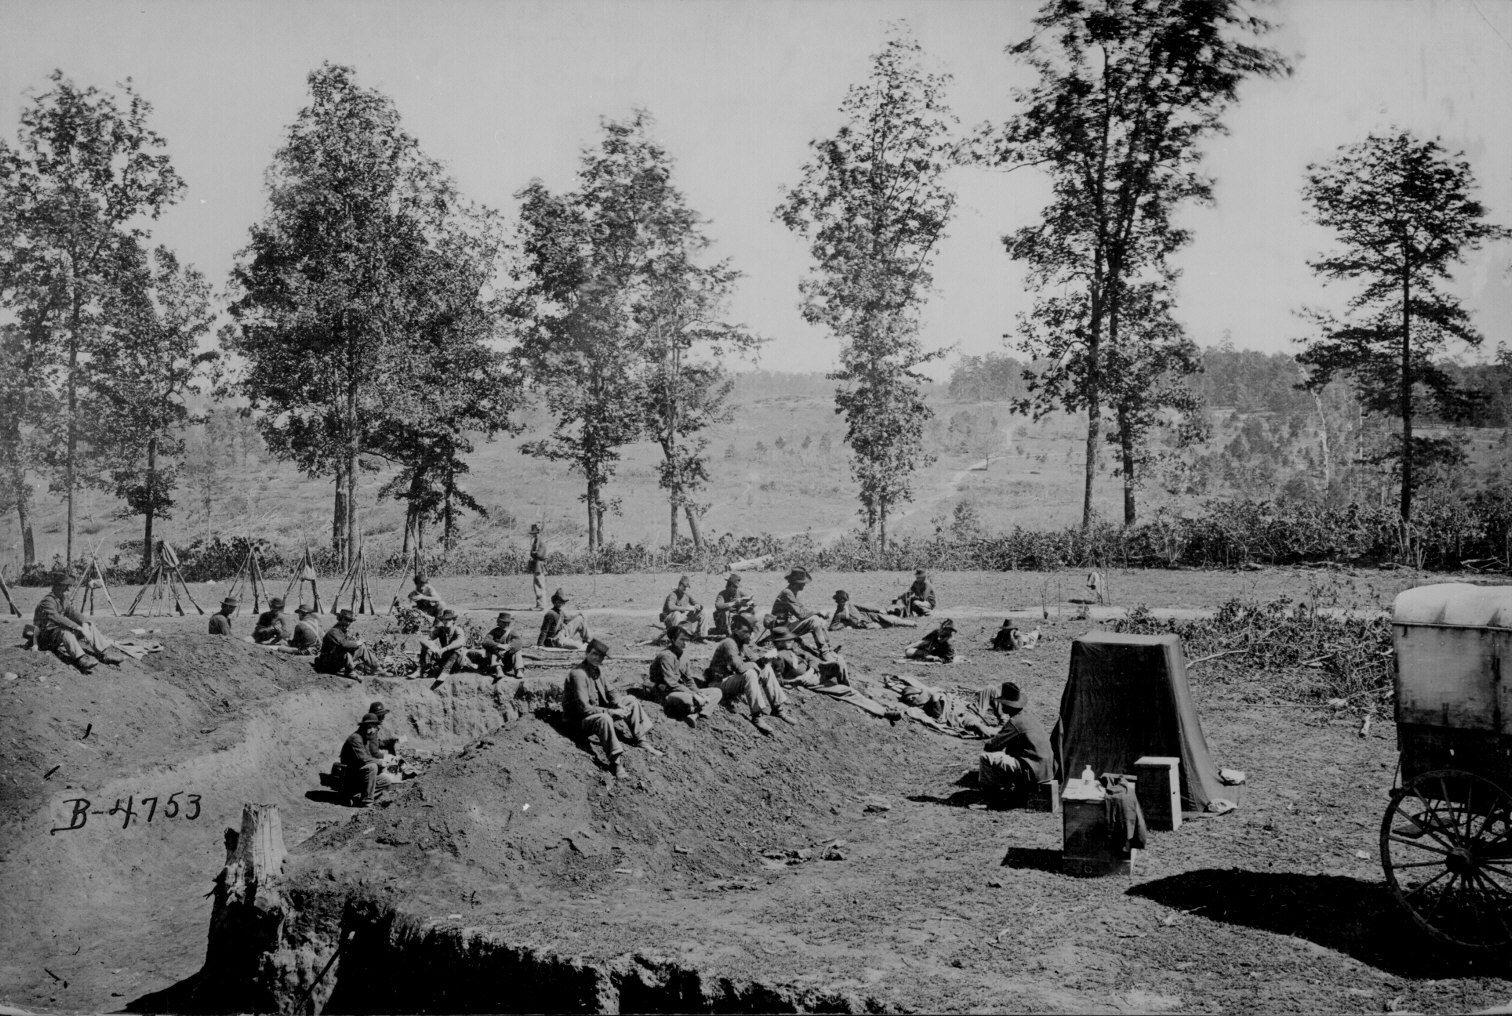 George Barnard S Photographic Equipment Atlanta Georgia Civil War Photography Civil War Photos American Civil War